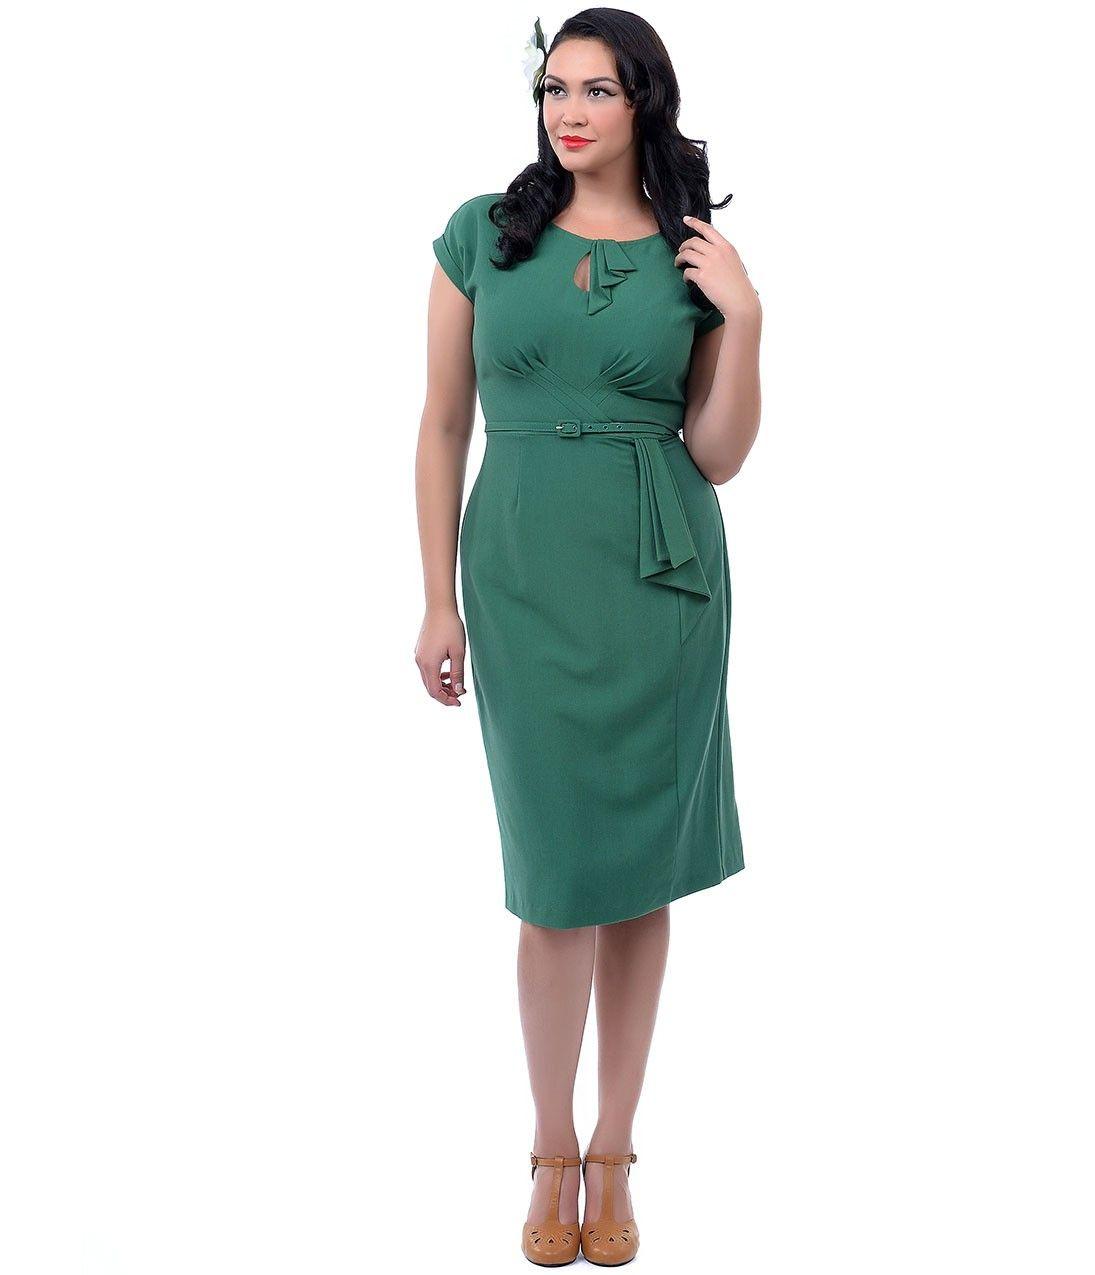 kelly green plus size dress gallery - dresses design ideas